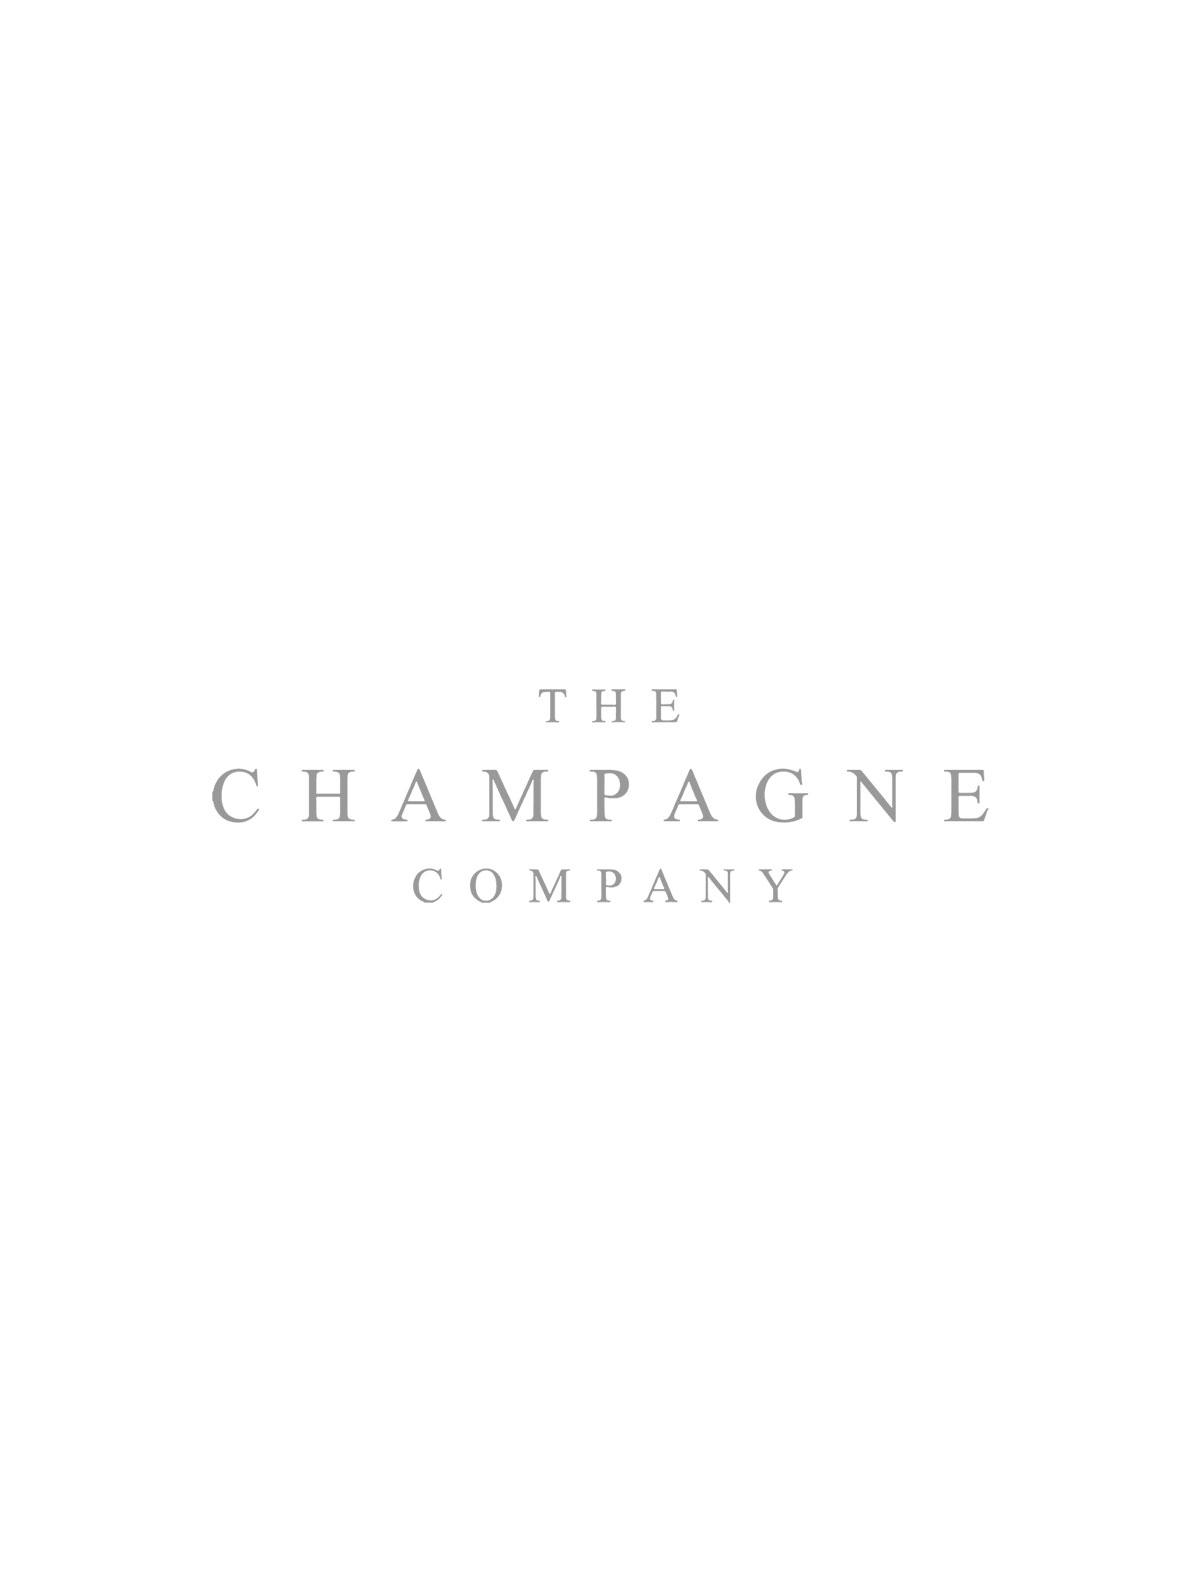 The Corimbo Wine Gift - Spain (2 Bottles & Wood Gift Box)